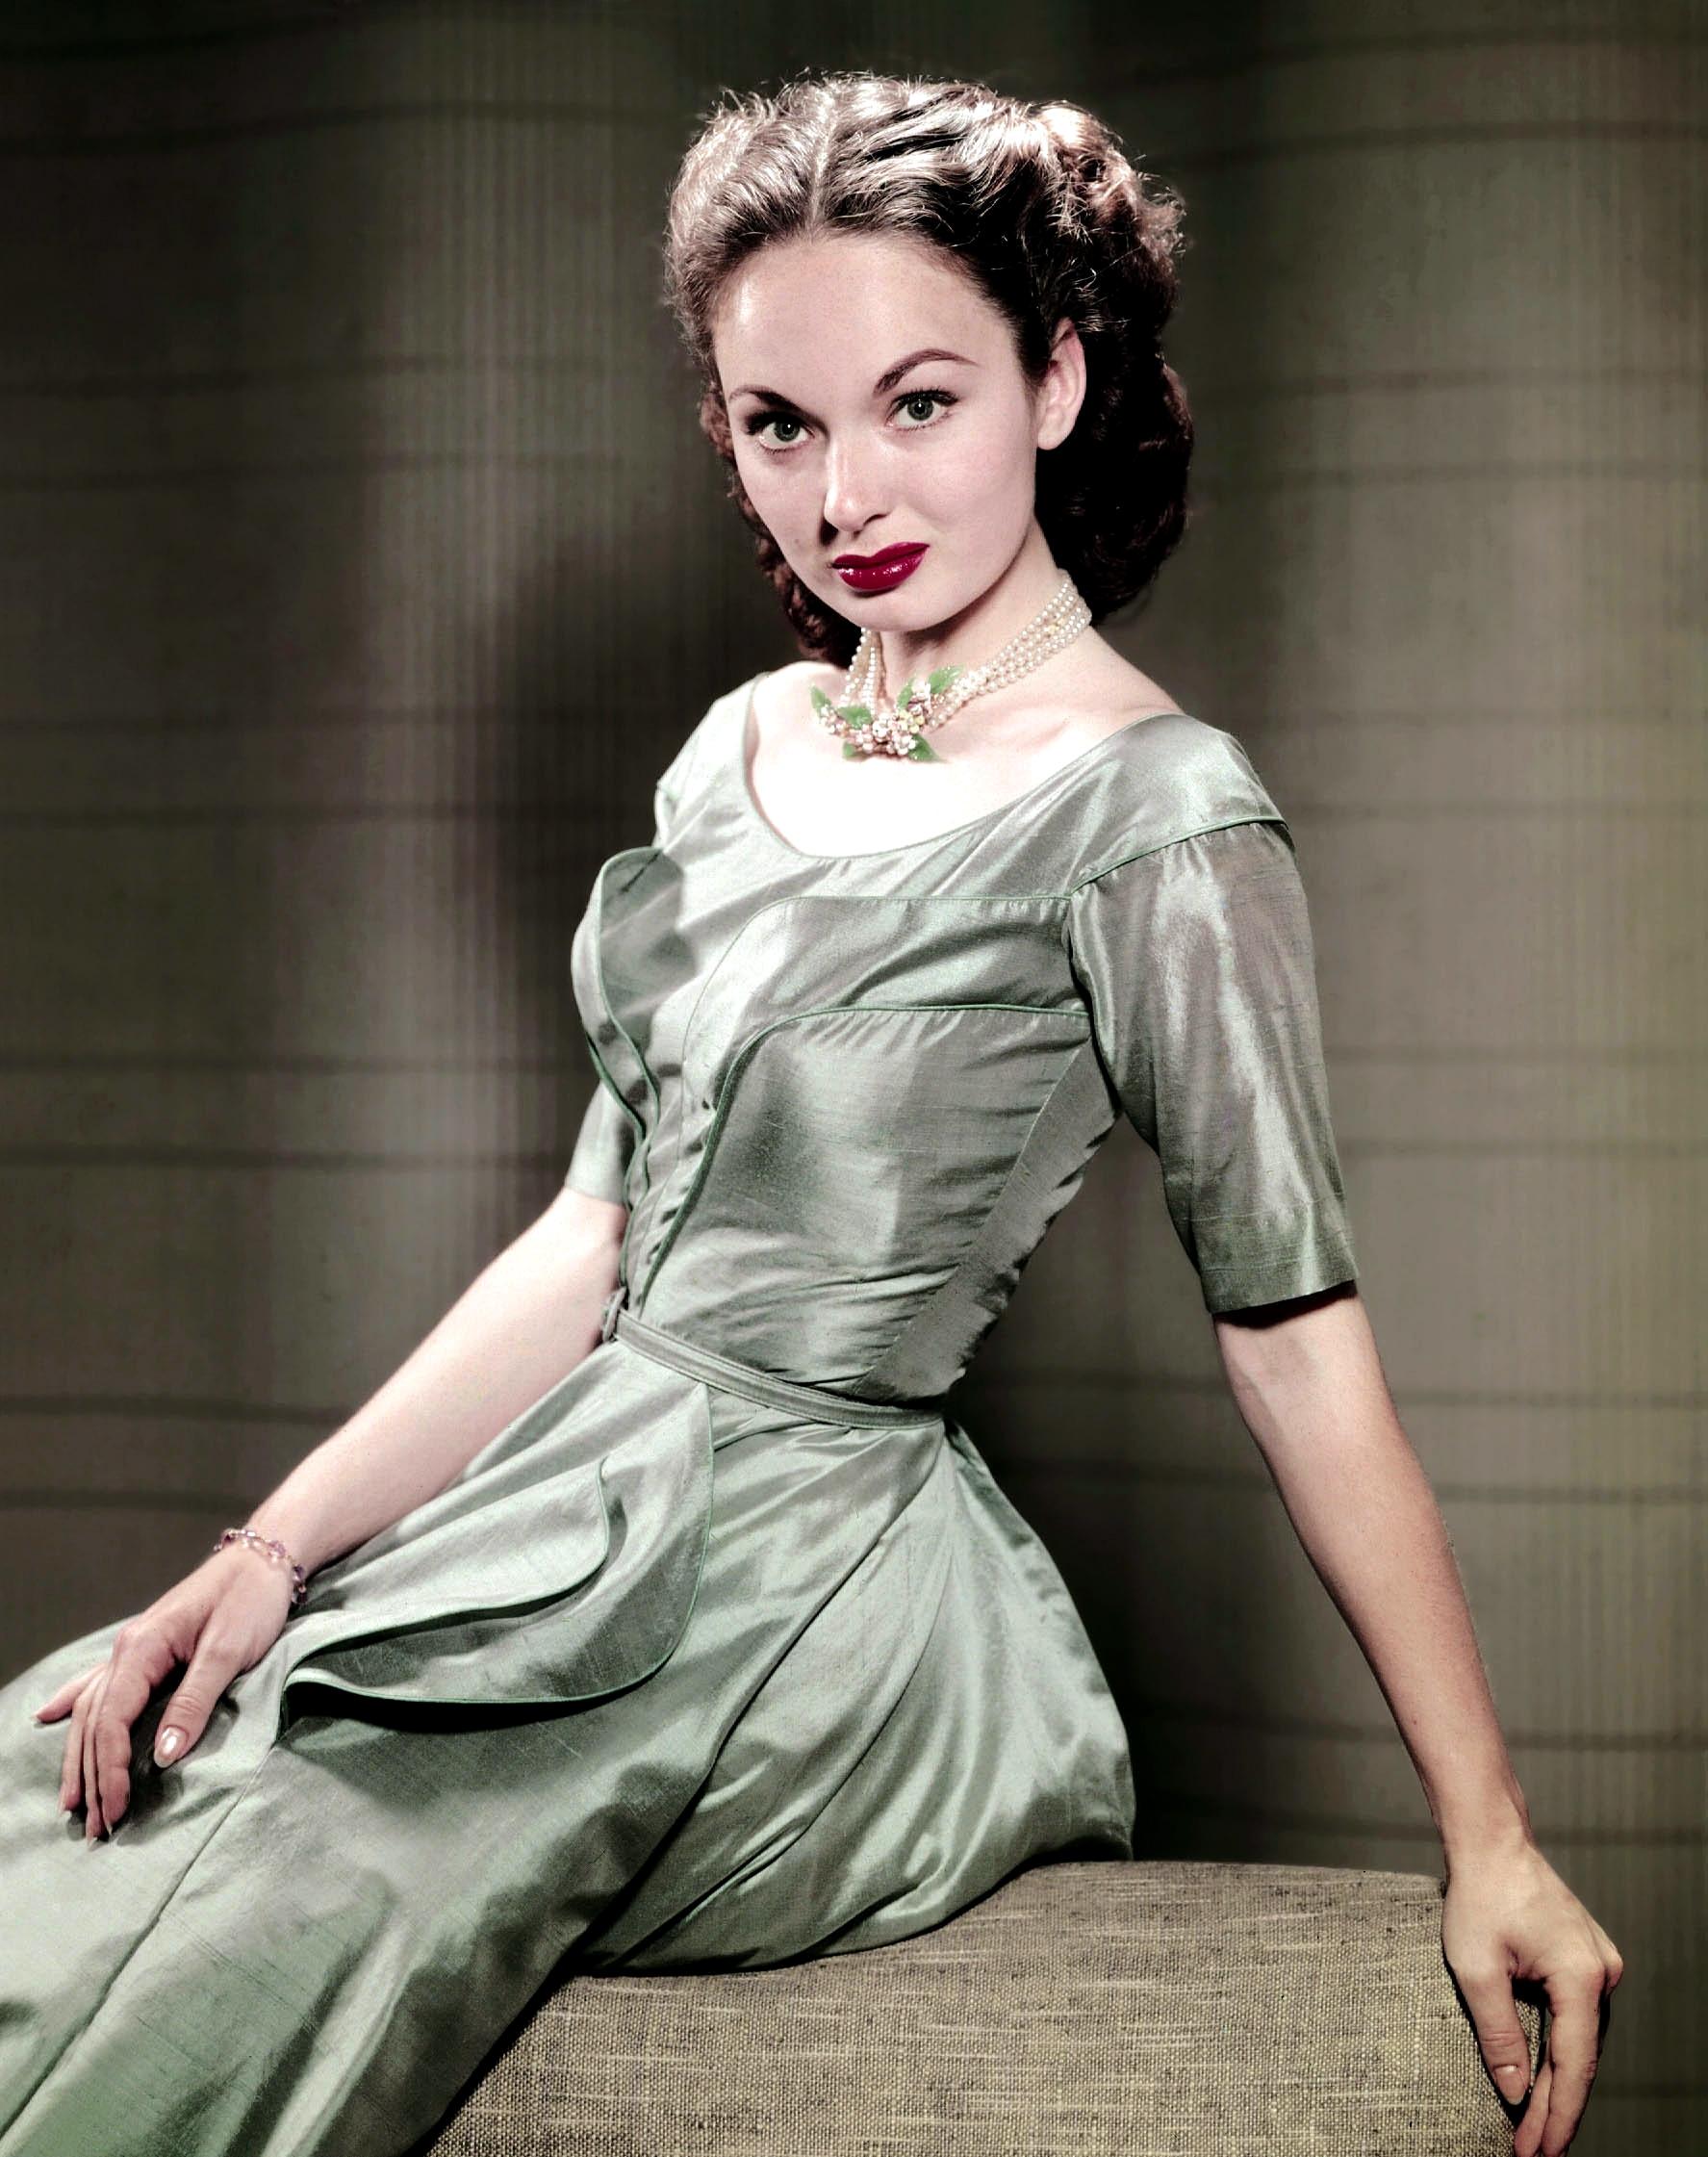 Ann Blyth - Photo Actress